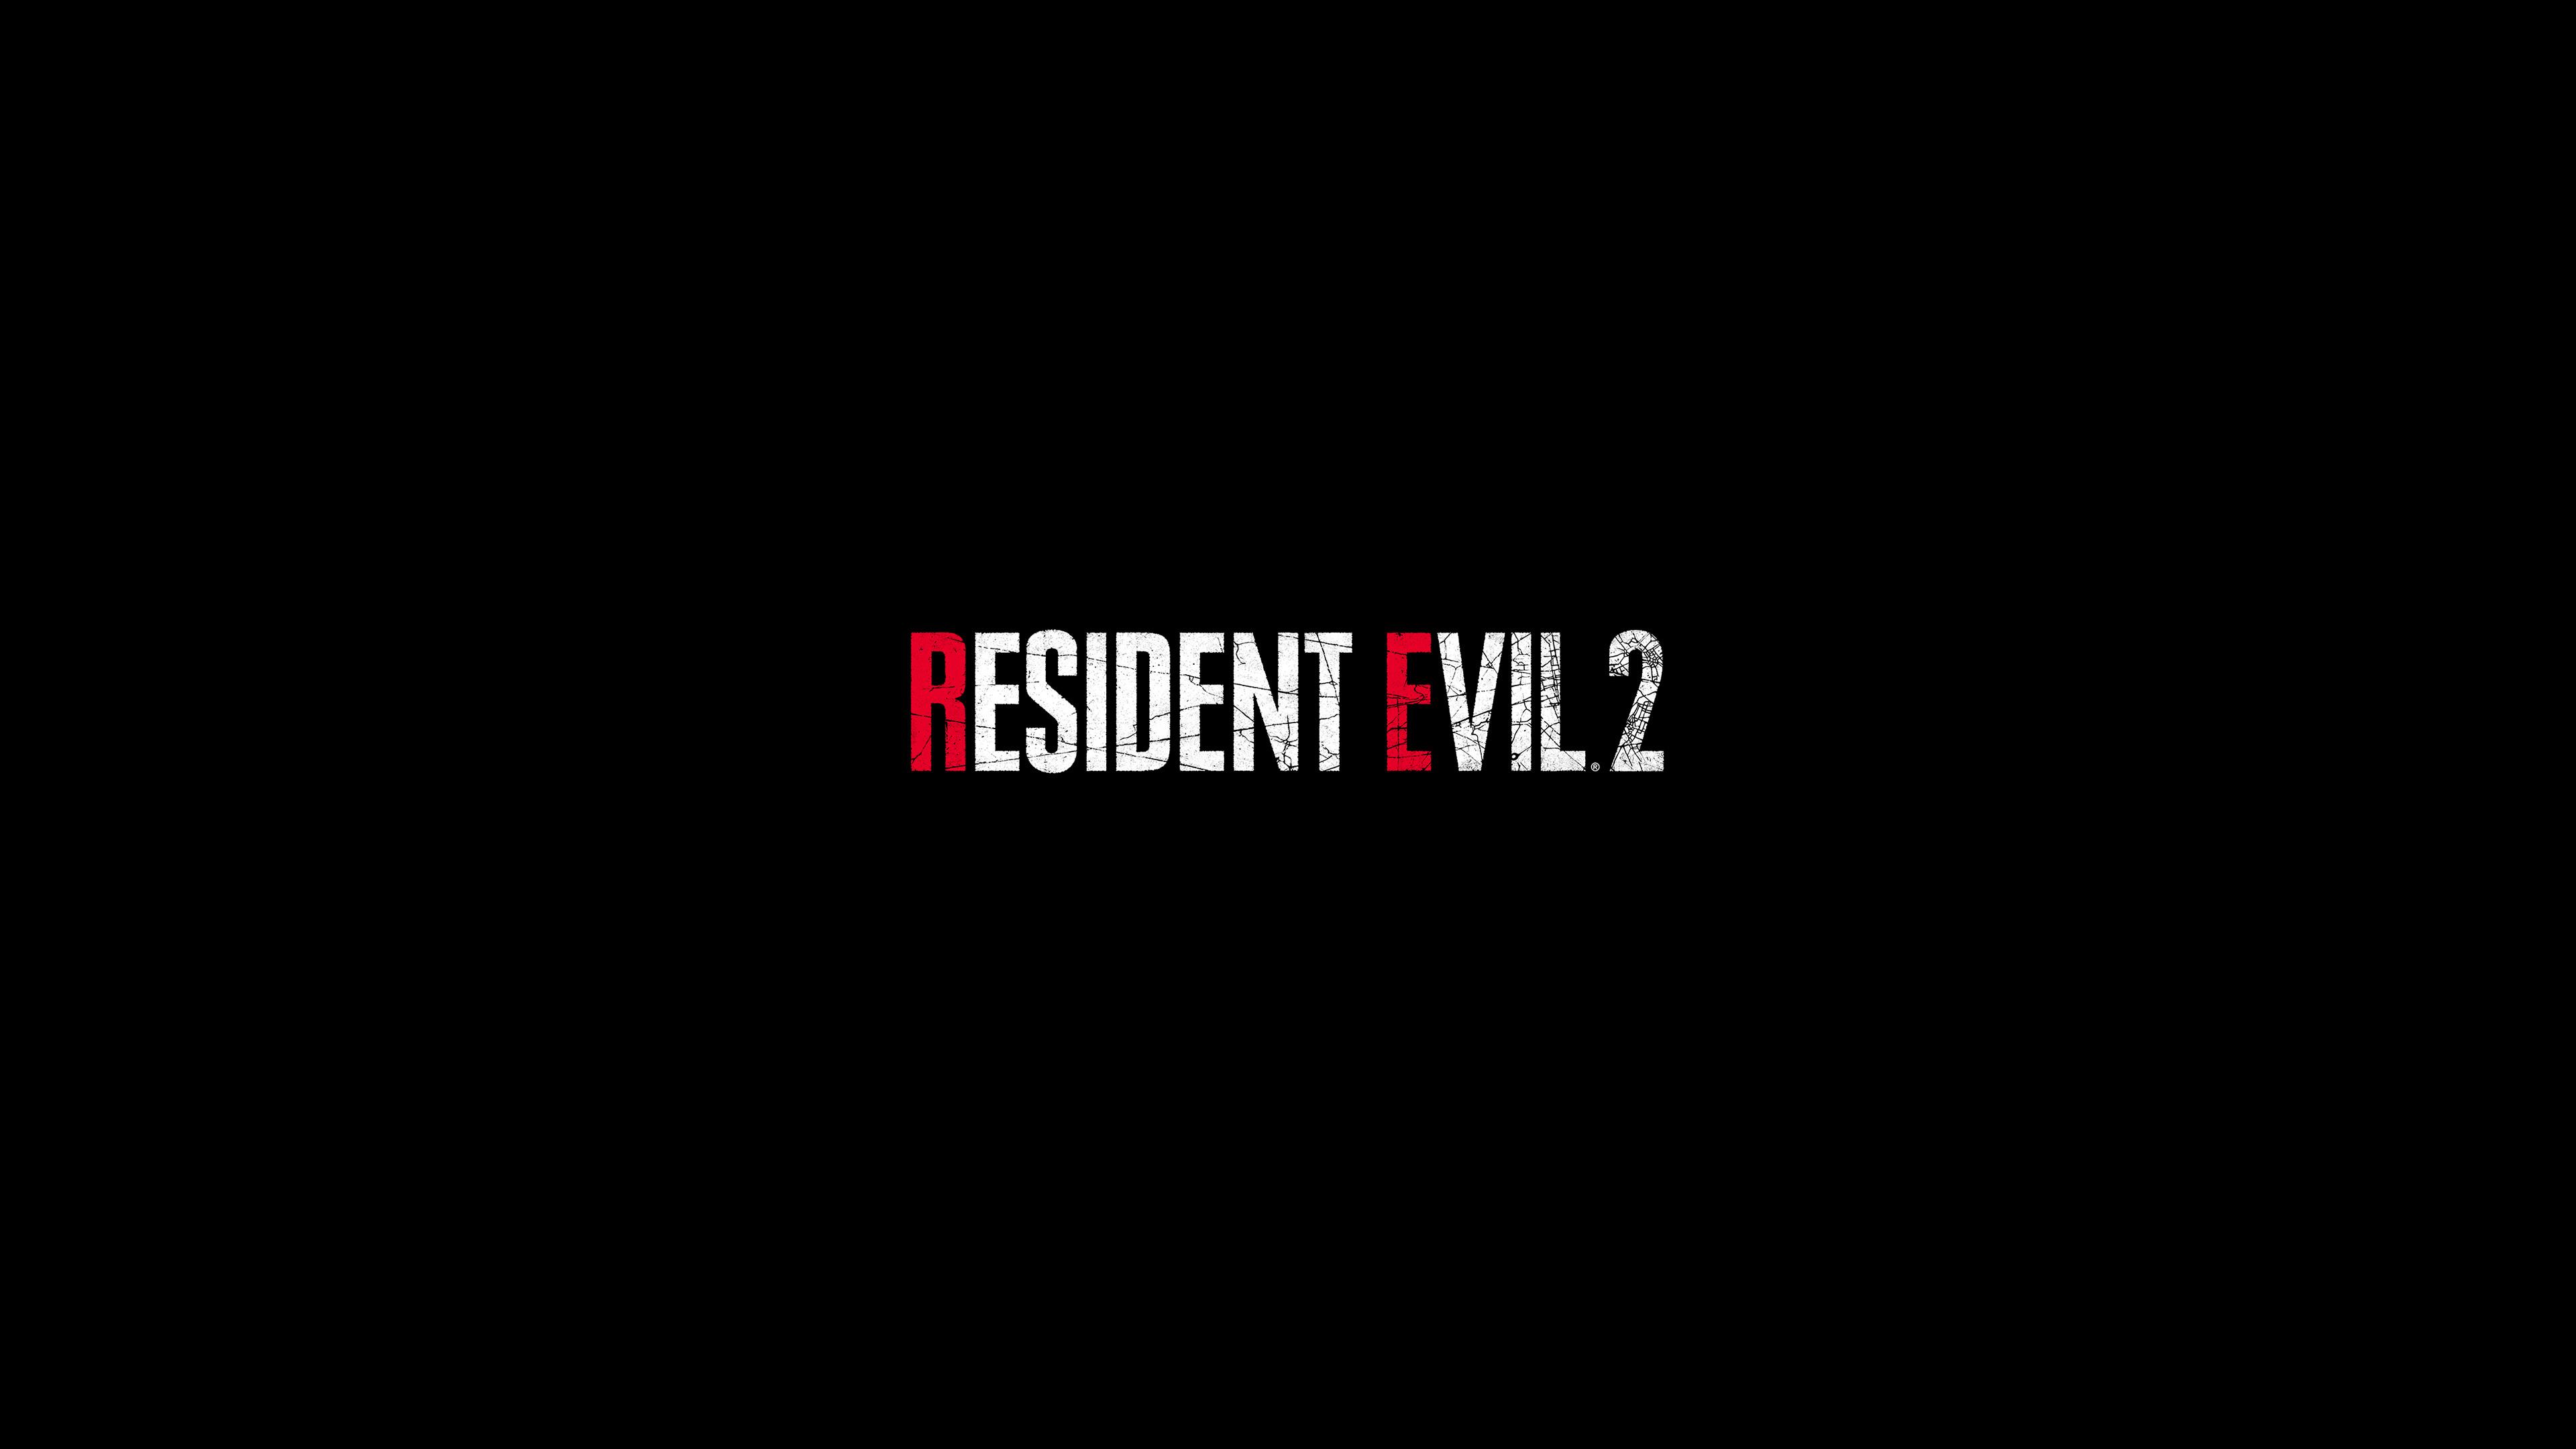 Resident Evil 2 Logo 4k Hd Games 4k Wallpapers Images